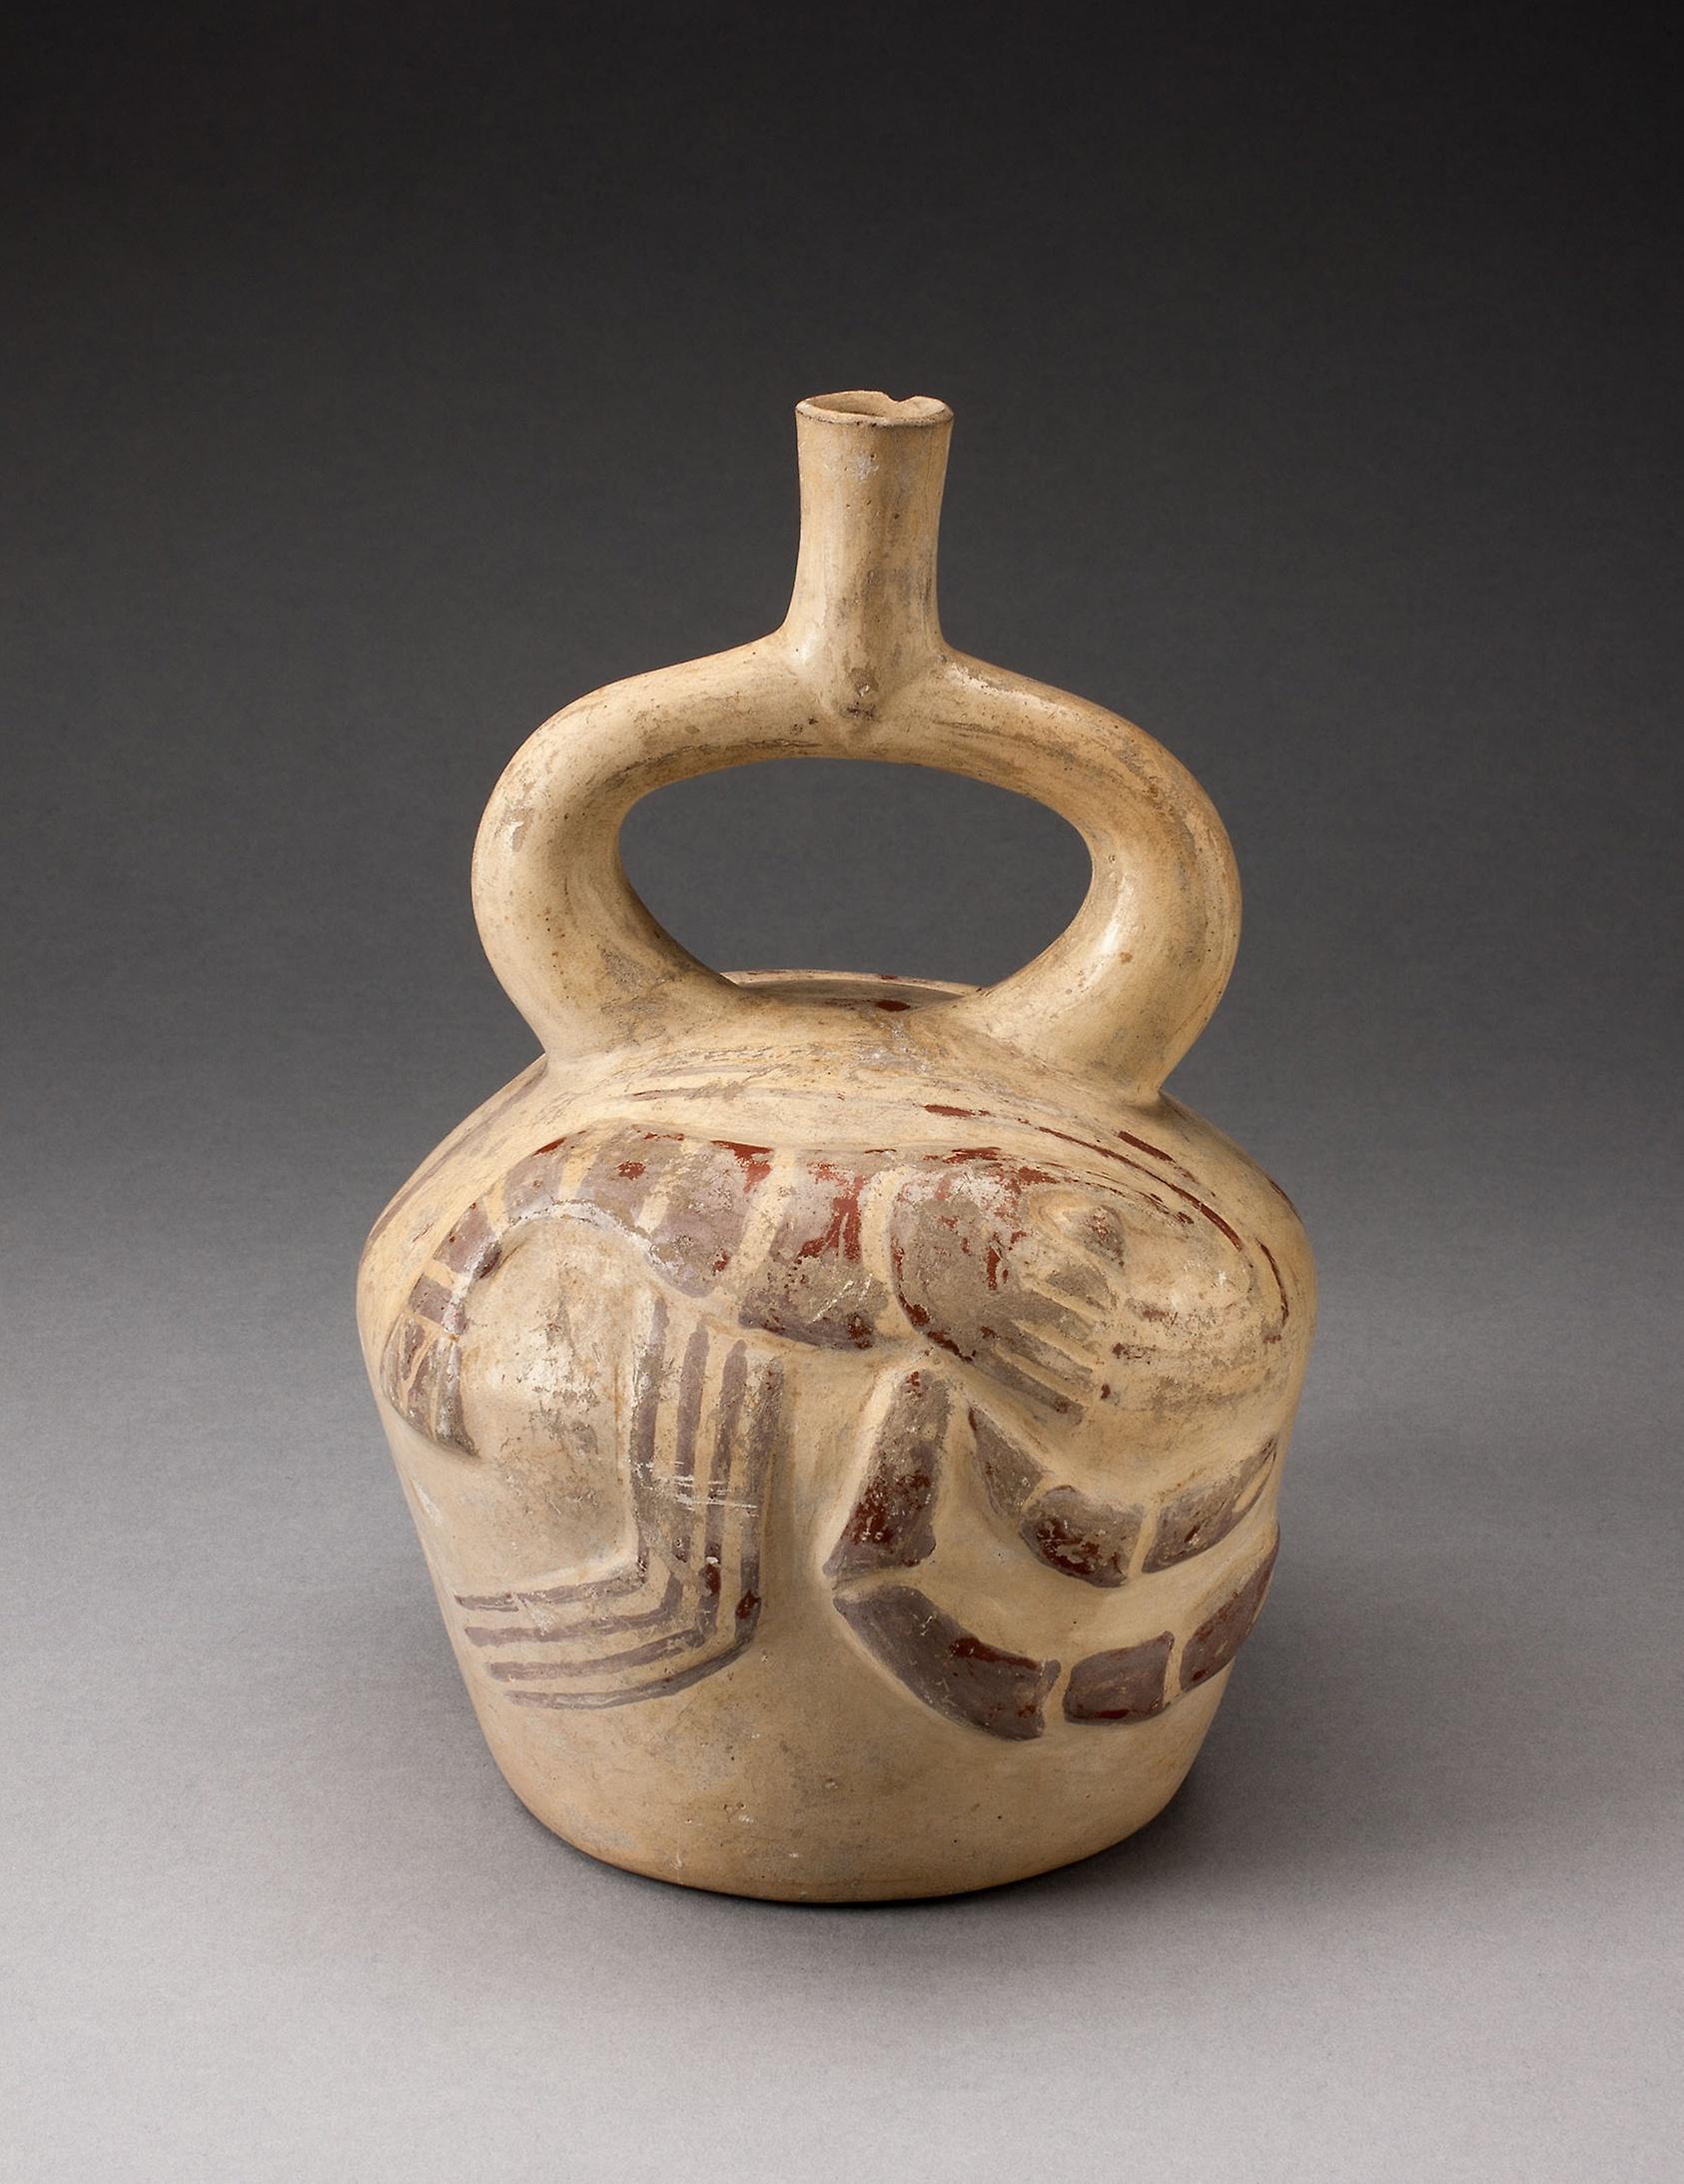 Moche Civilisation - Stirrup Spout Vessel with Raised Lobster Motifs Date- 100 B.C. A.D. 500   (image: Art Institute of Chicago)